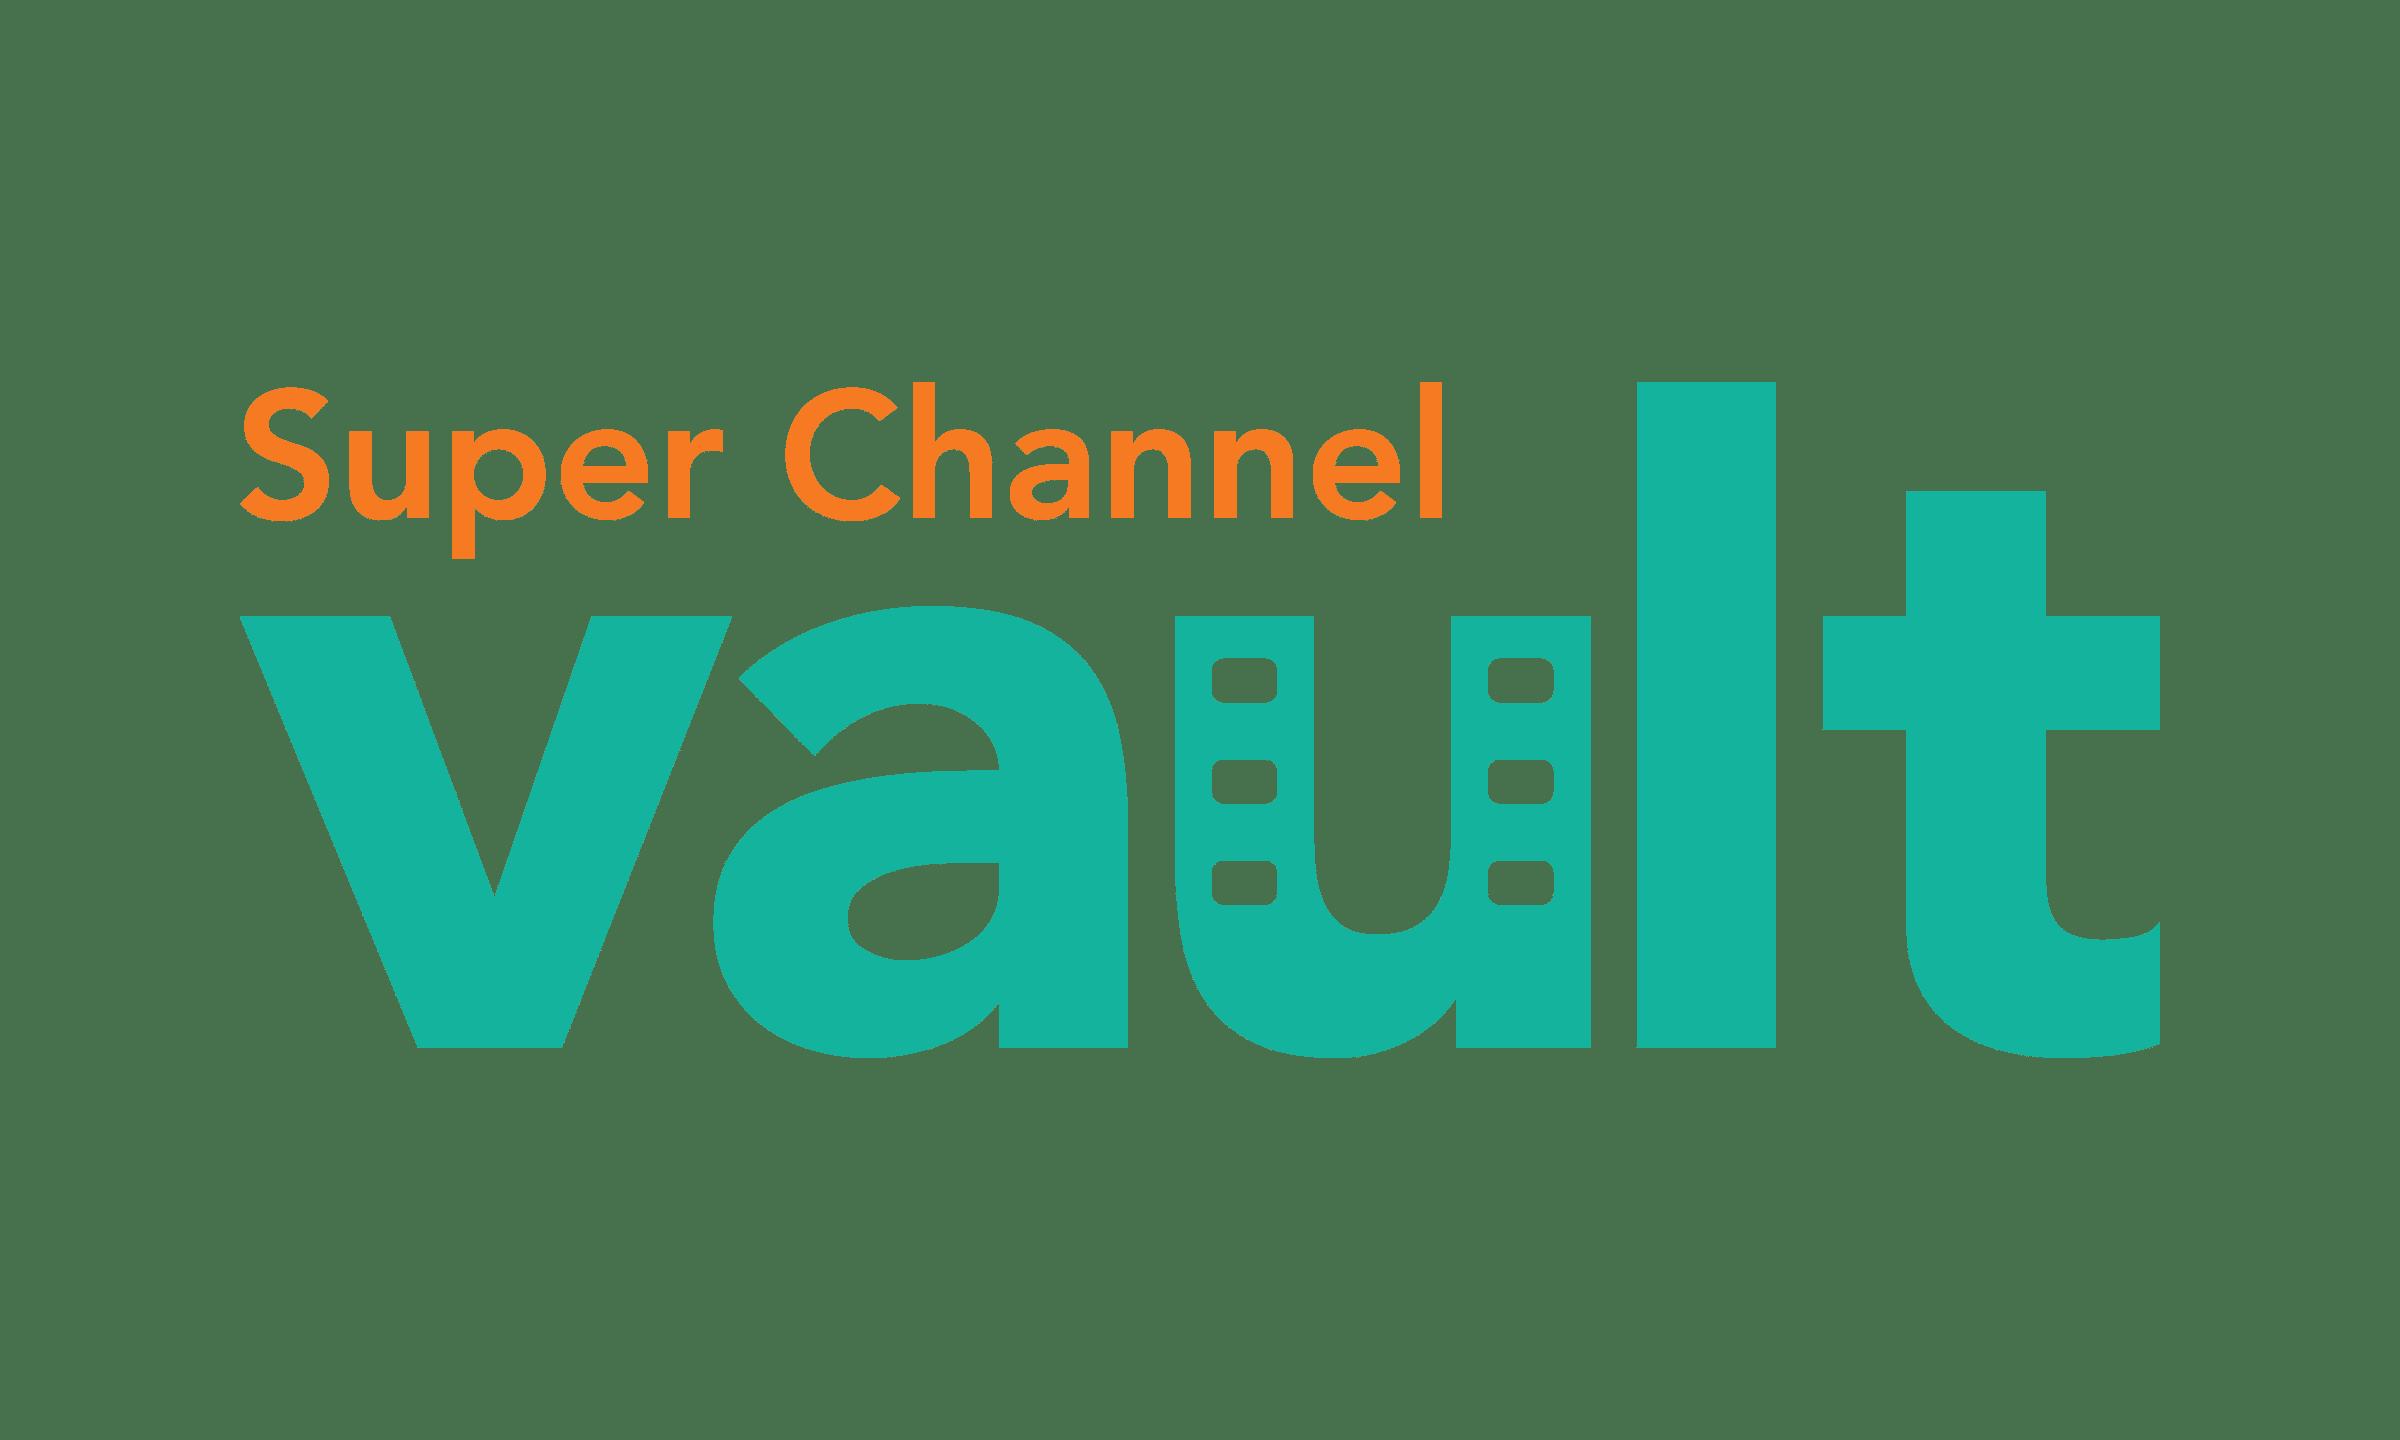 Super Channel Vault